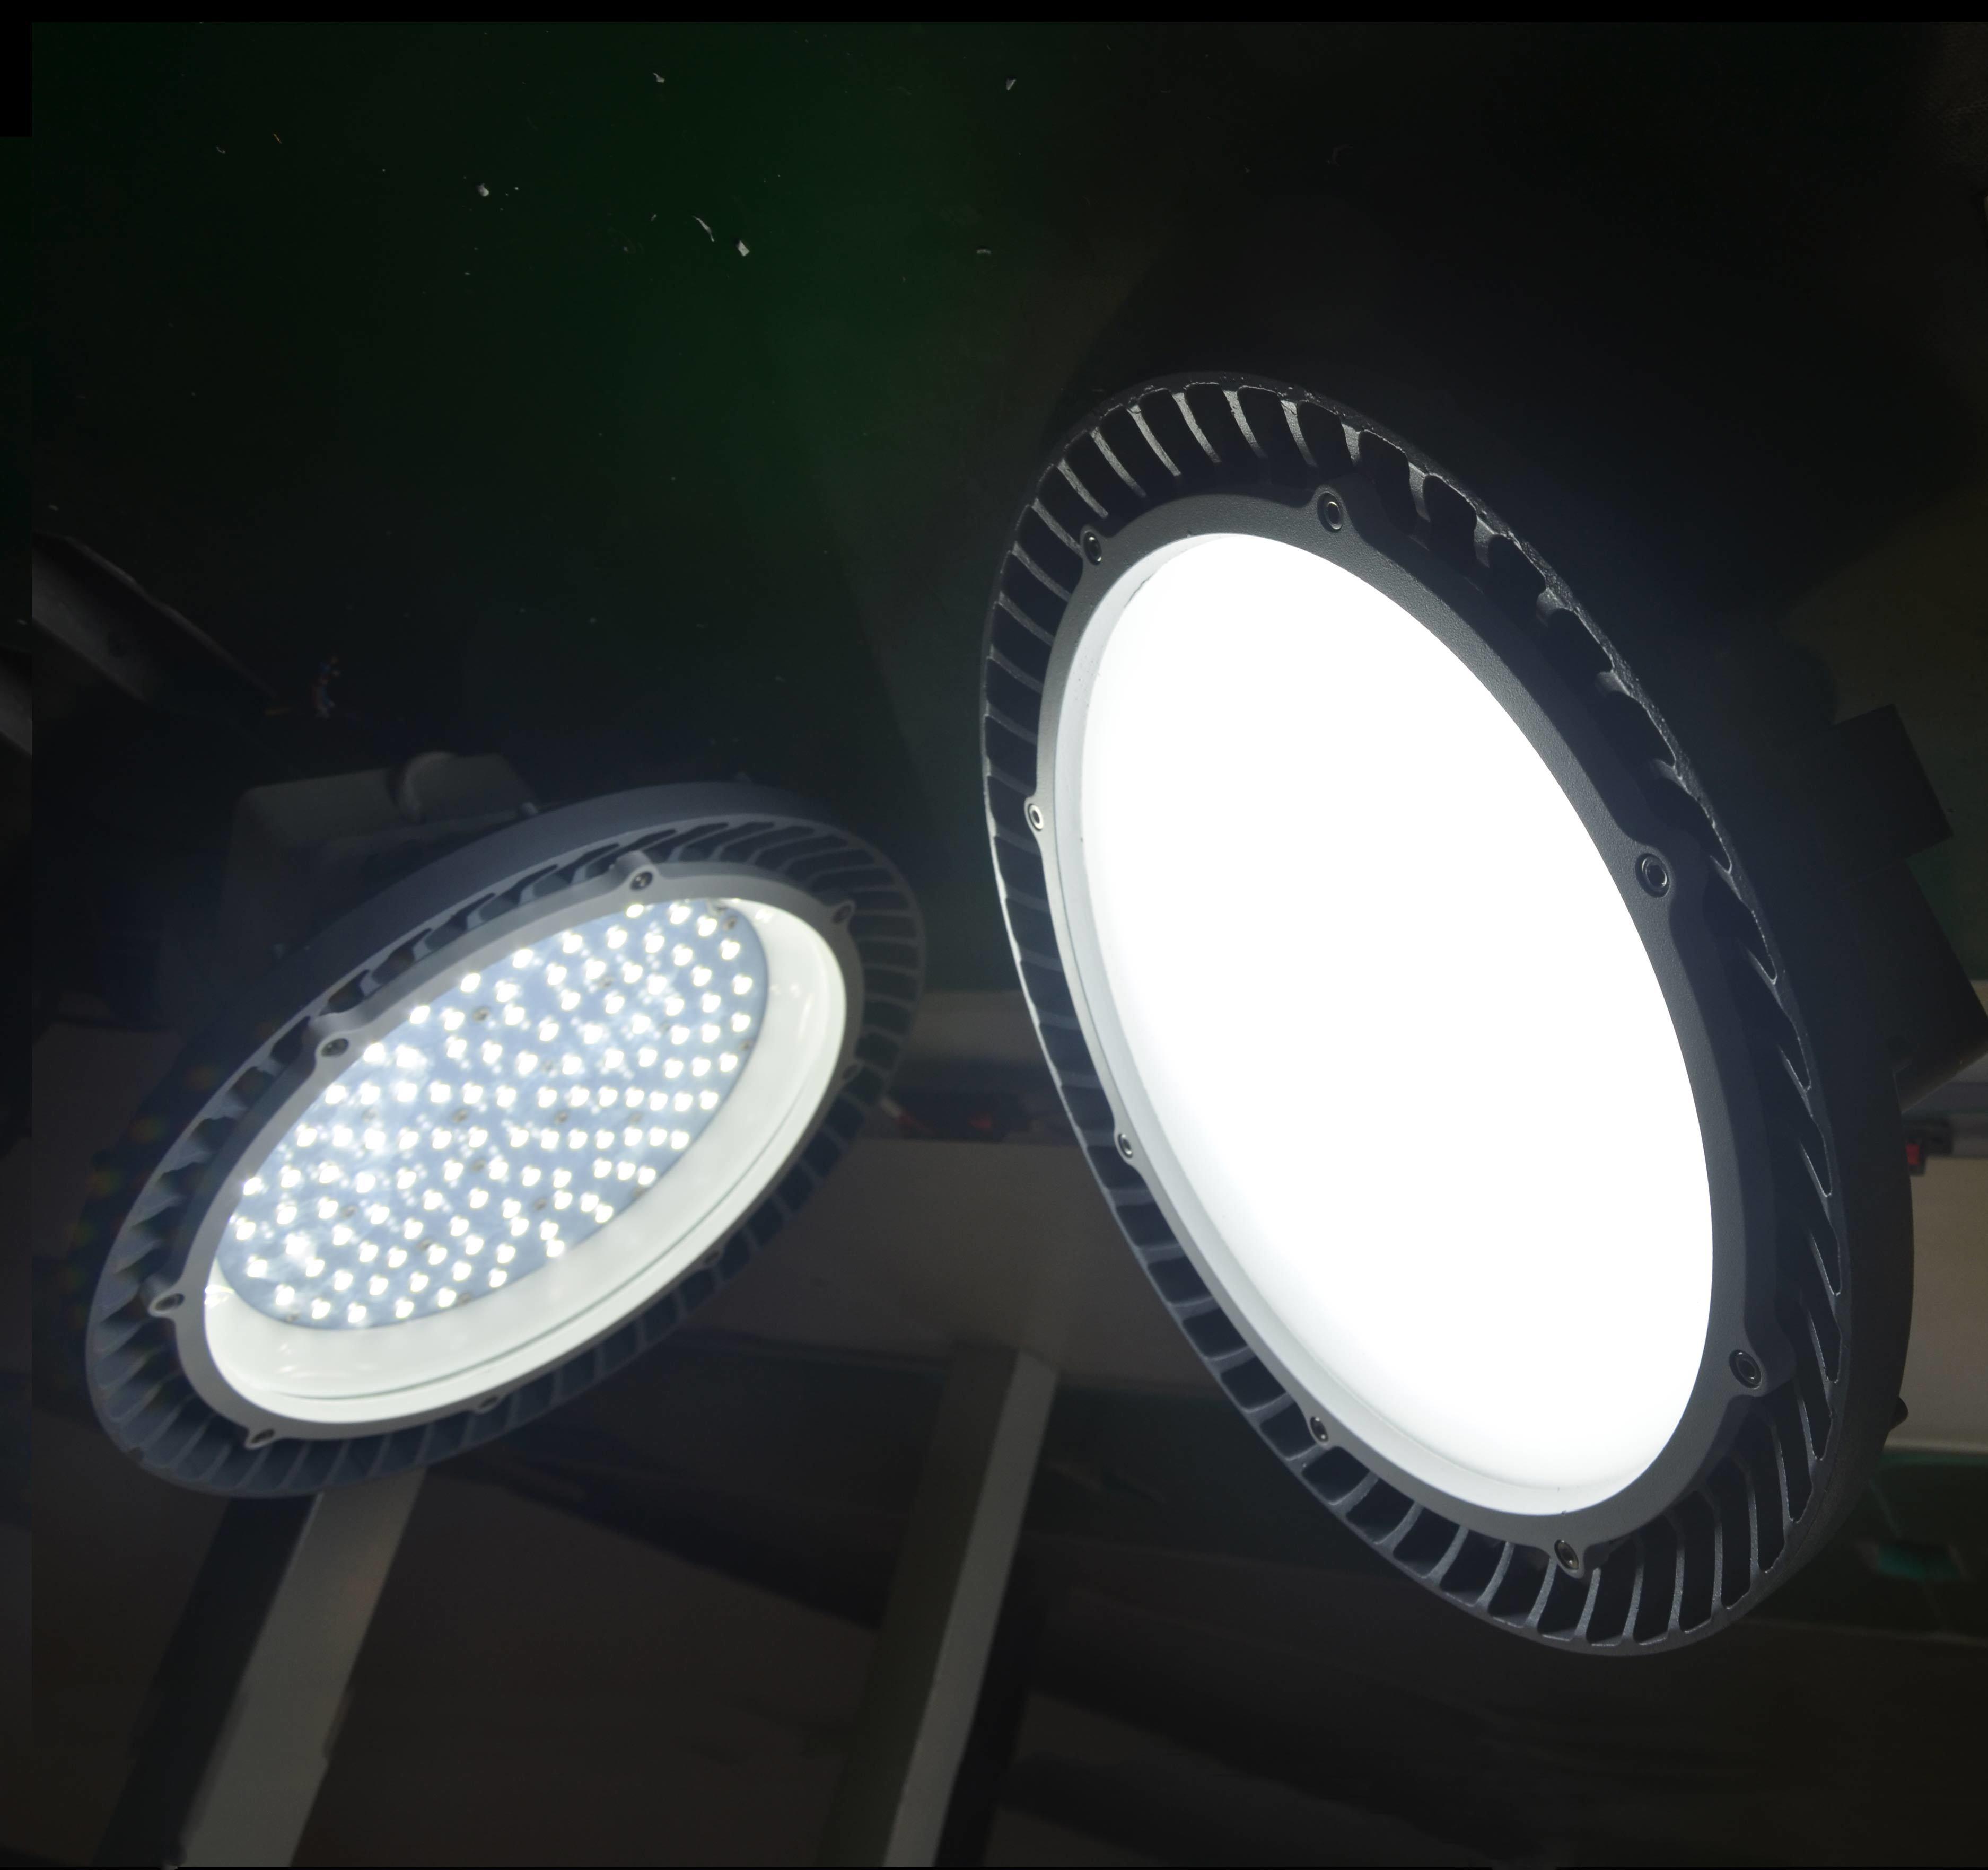 95W Outdoor LED High Bay Light (Bfz 220/90 Xx Y)